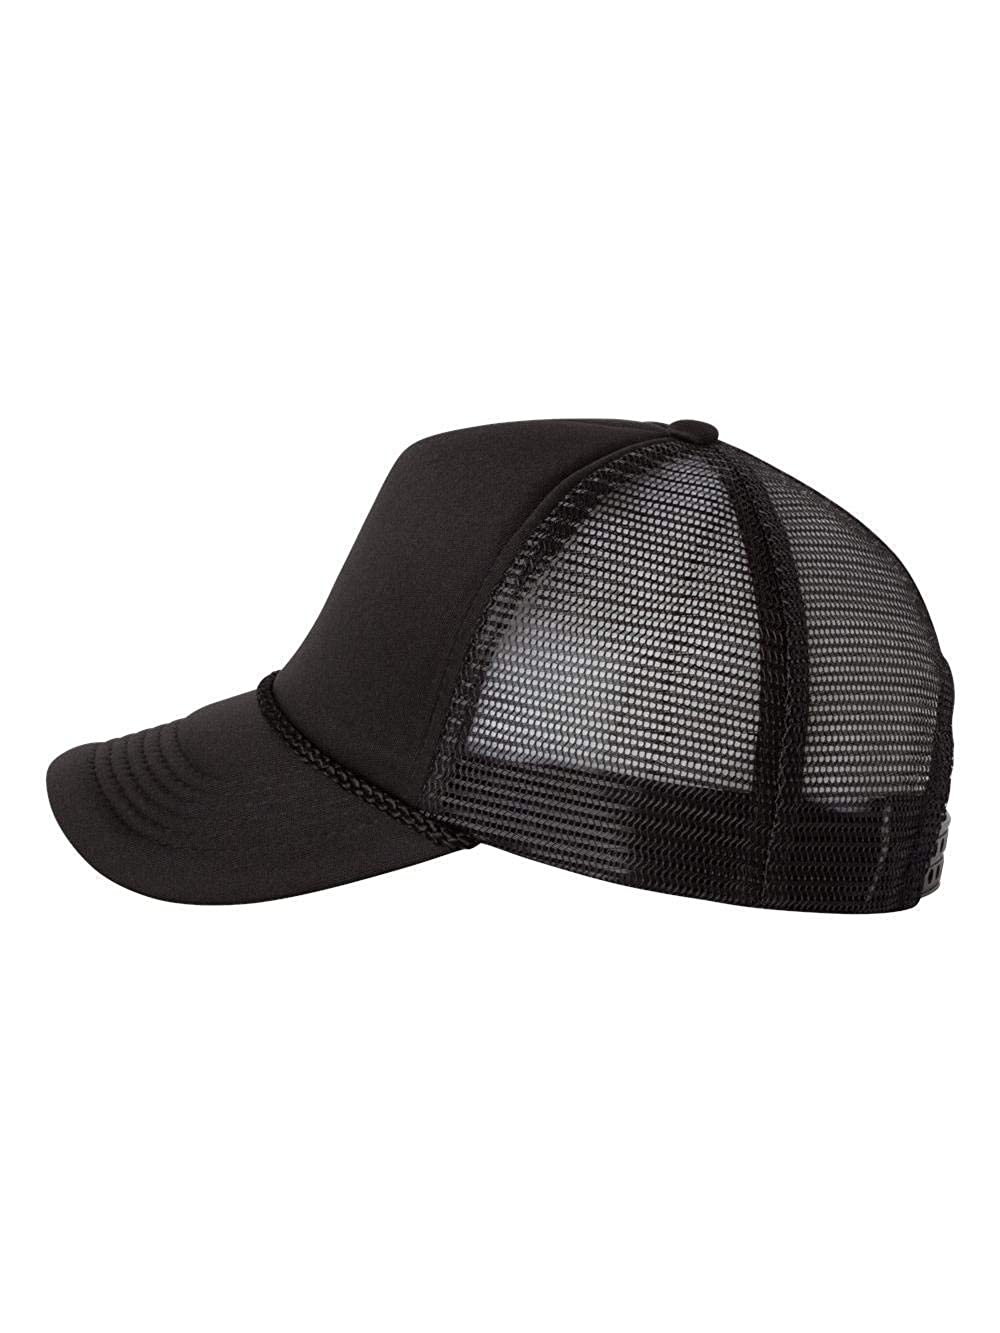 3c826a3d2616a4 Foam Trucker Cap, Color: Black/ Black, Size: One Size at Amazon Men's  Clothing store: Baseball Caps